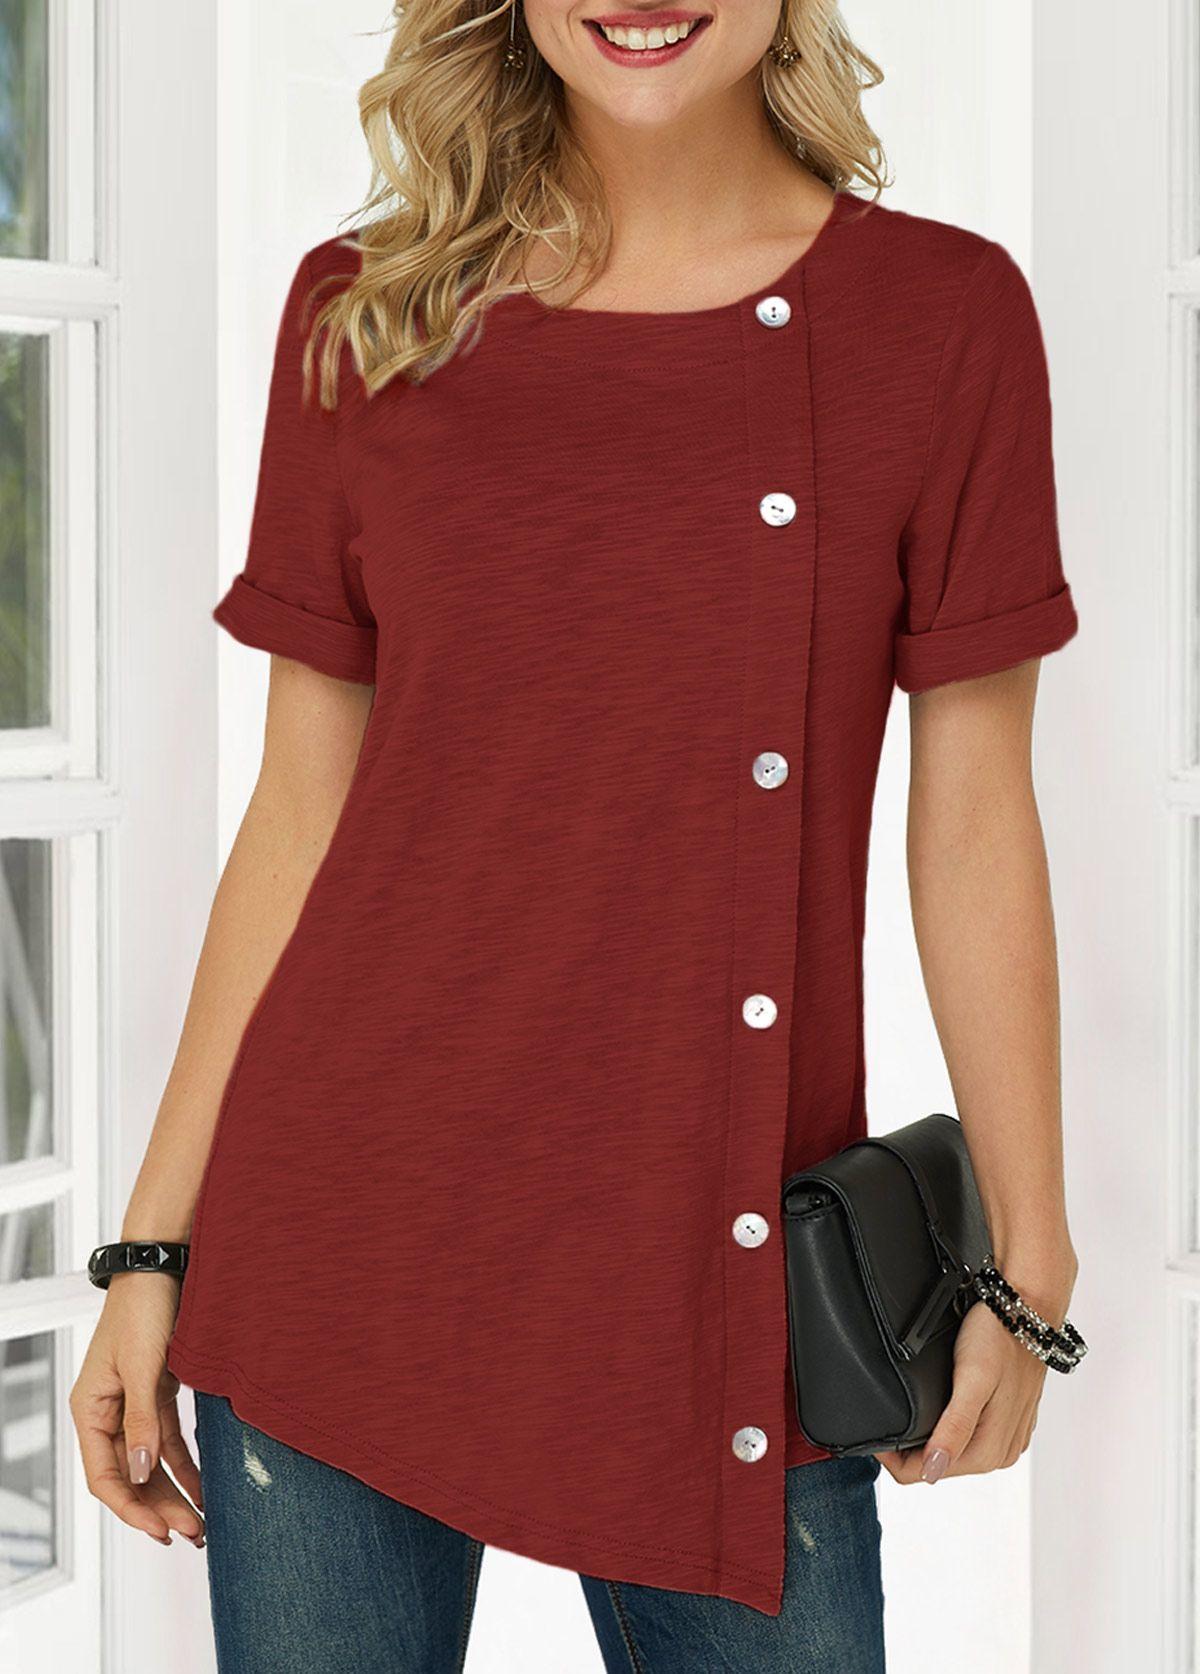 Button Detail Wine Red Asymmetric Hem T Shirt | modlily.com - USD $26.93